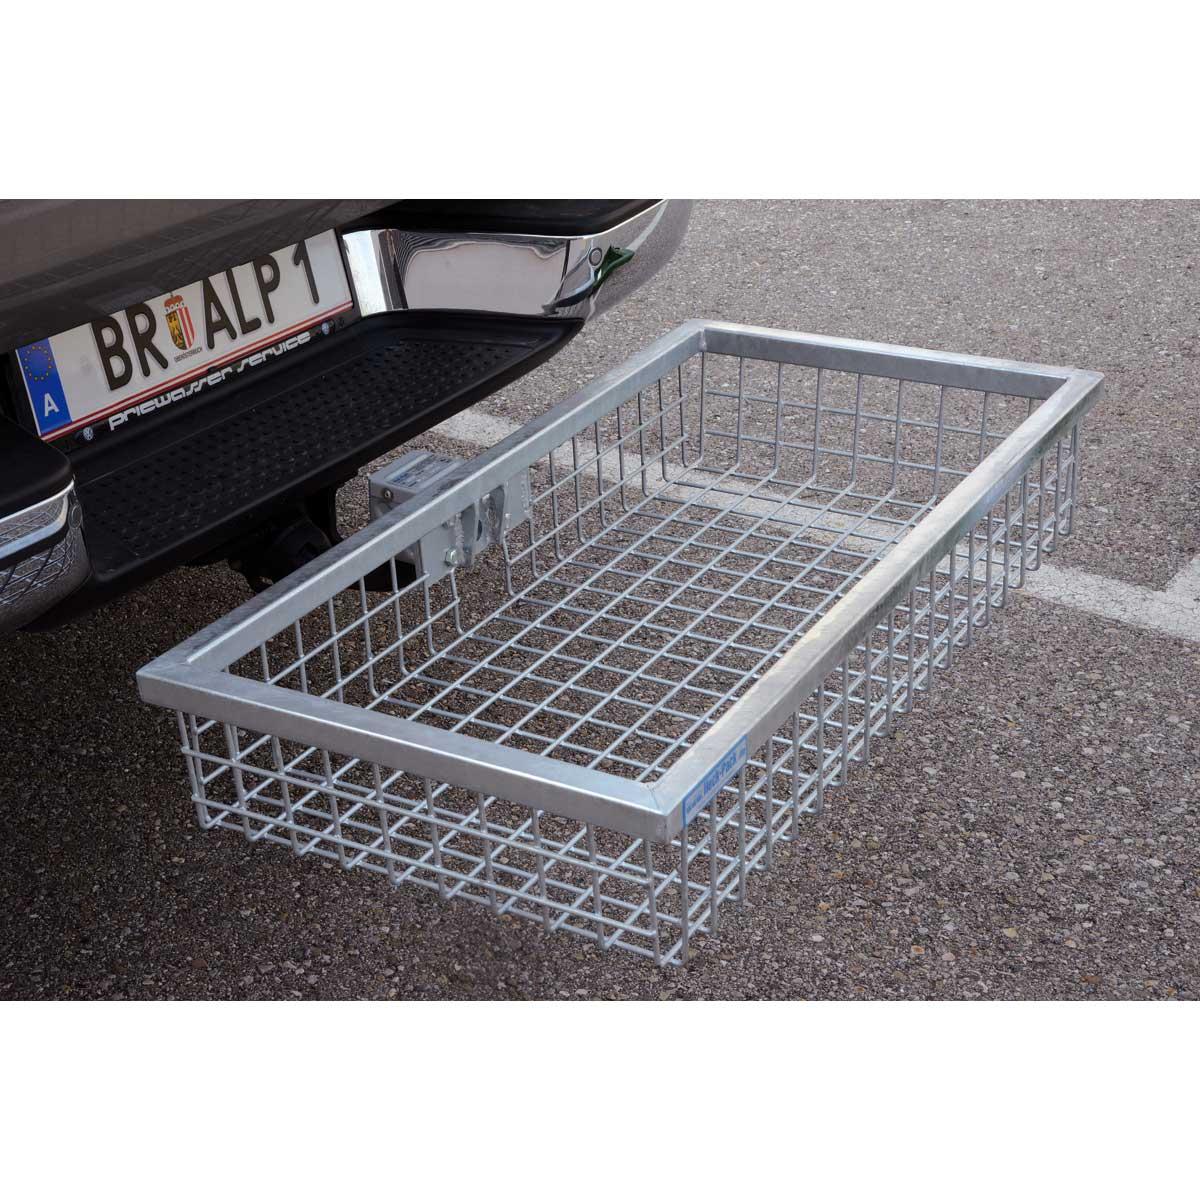 Groß Jagd Rahmen Pack Galerie - Benutzerdefinierte Bilderrahmen ...